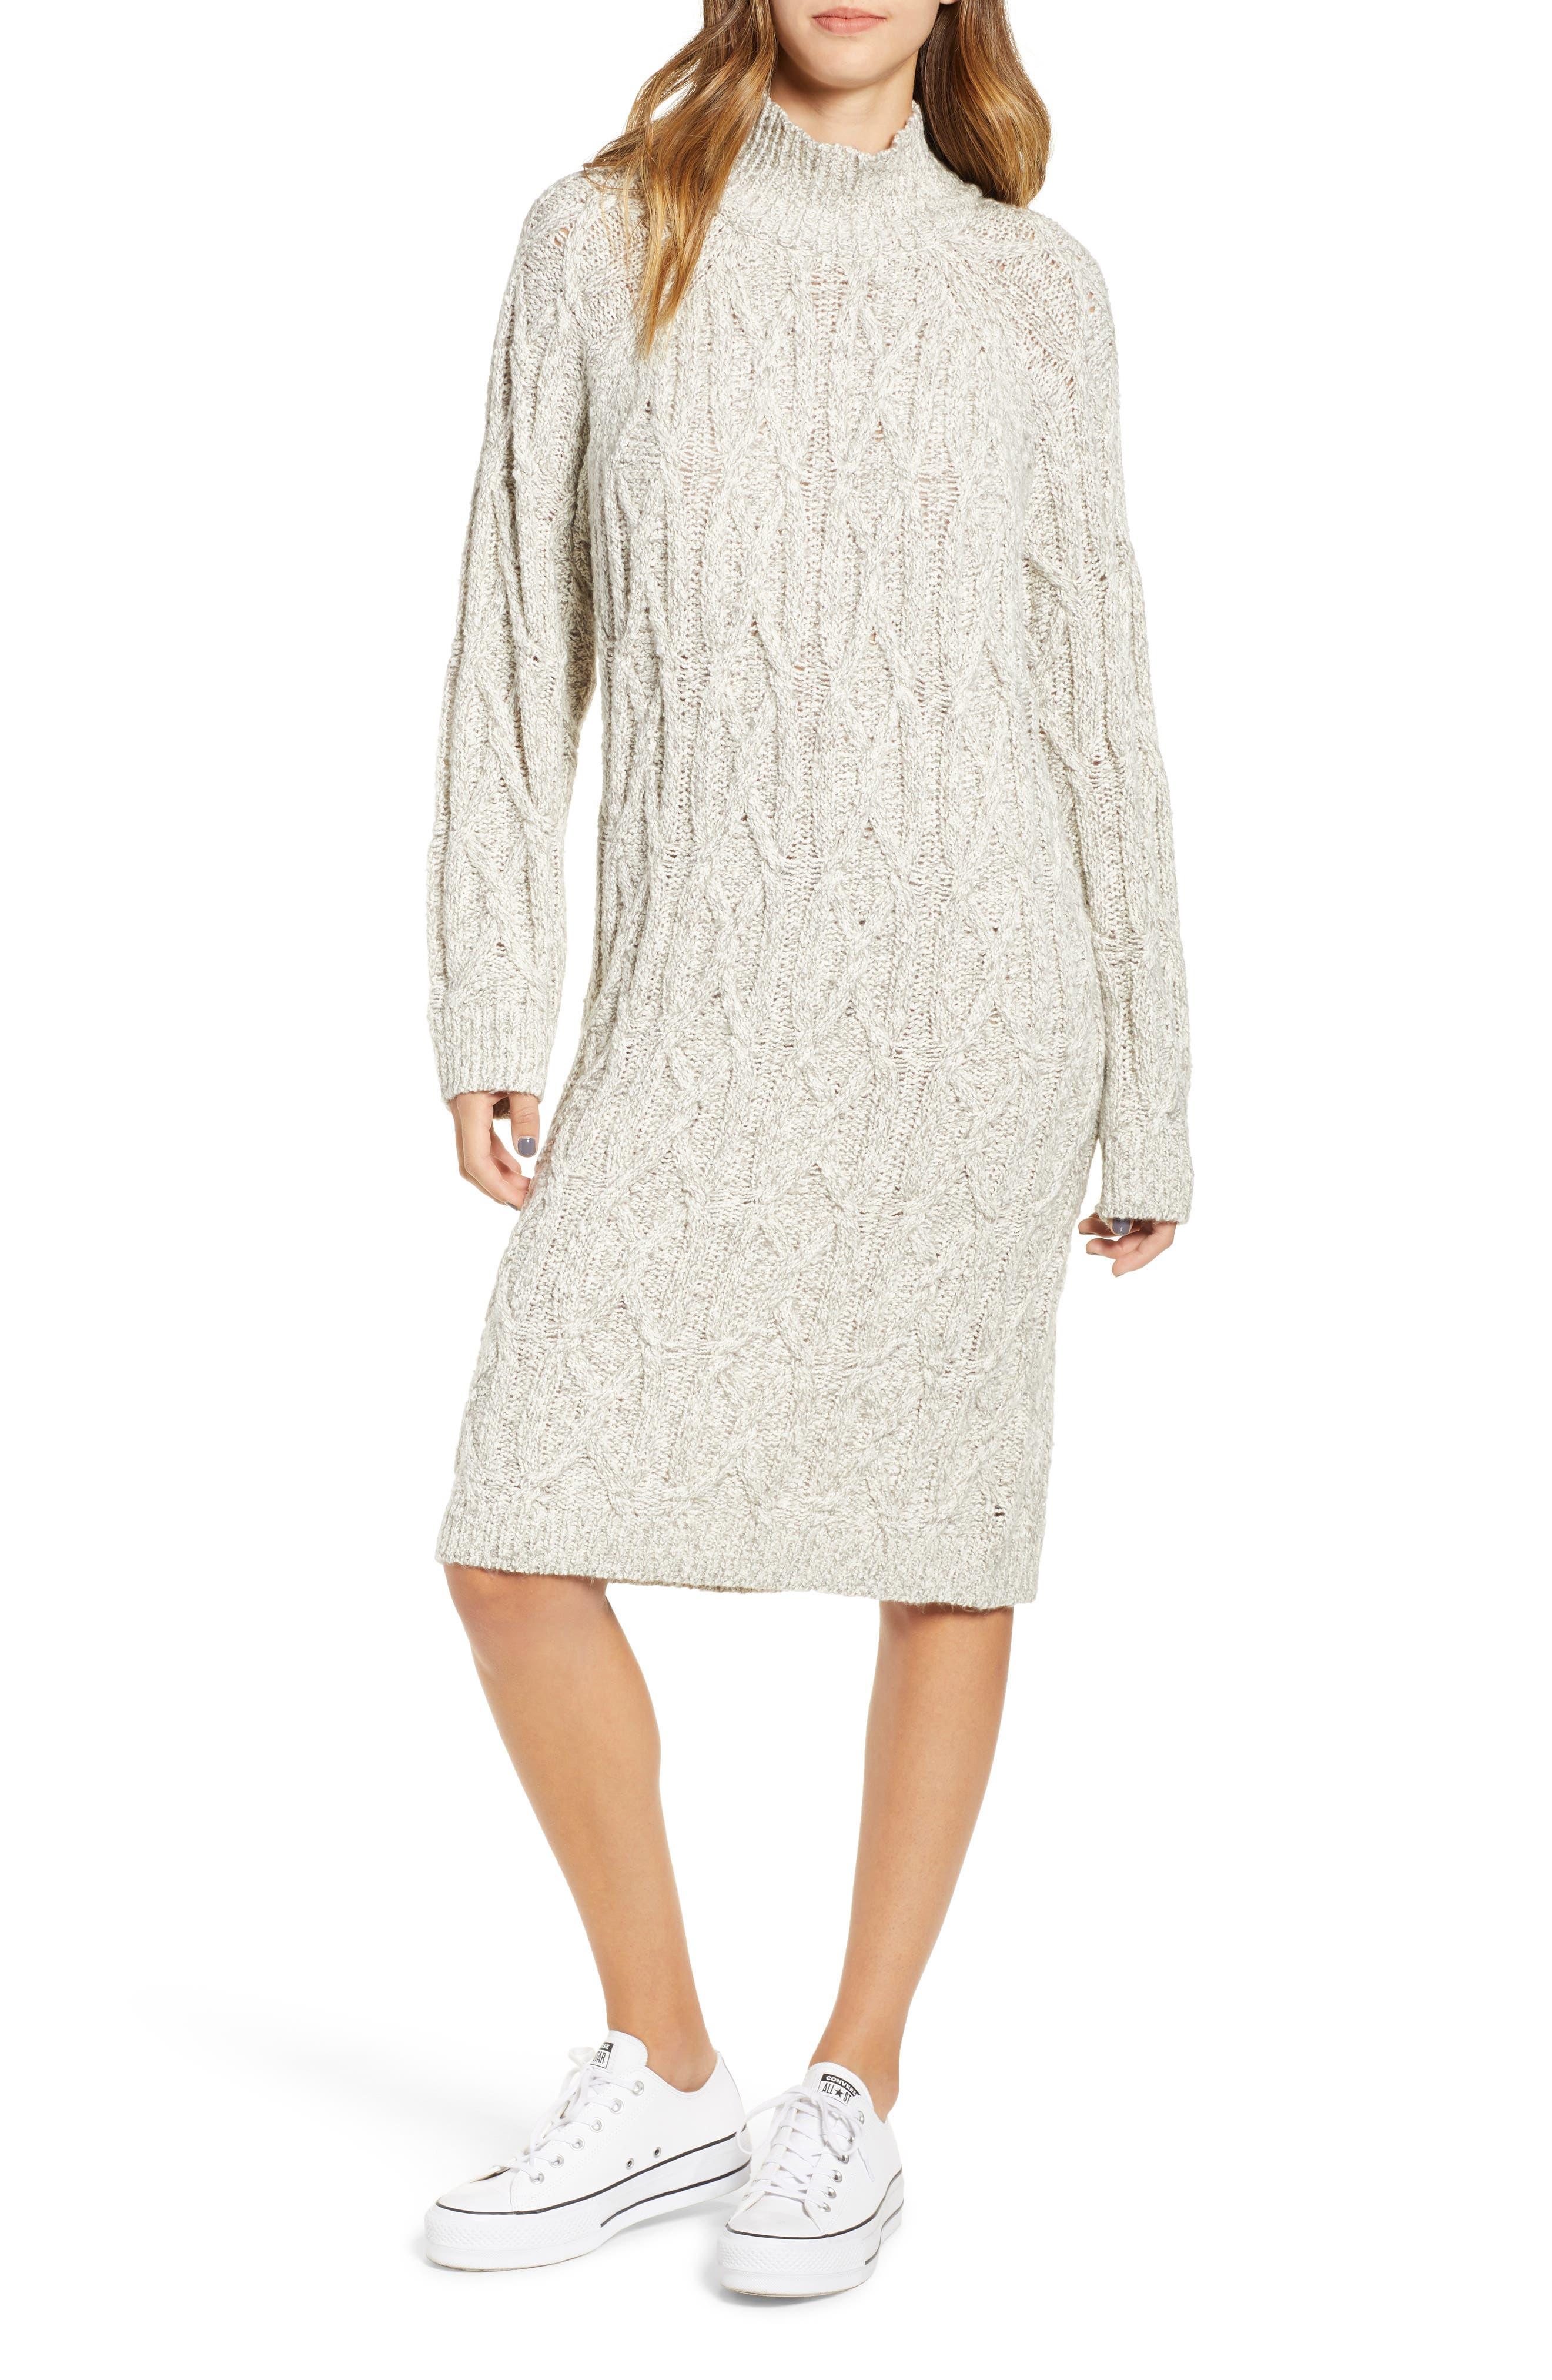 Cable Knit Sweater Dress,                             Main thumbnail 1, color,                             GREY PEARL MARL